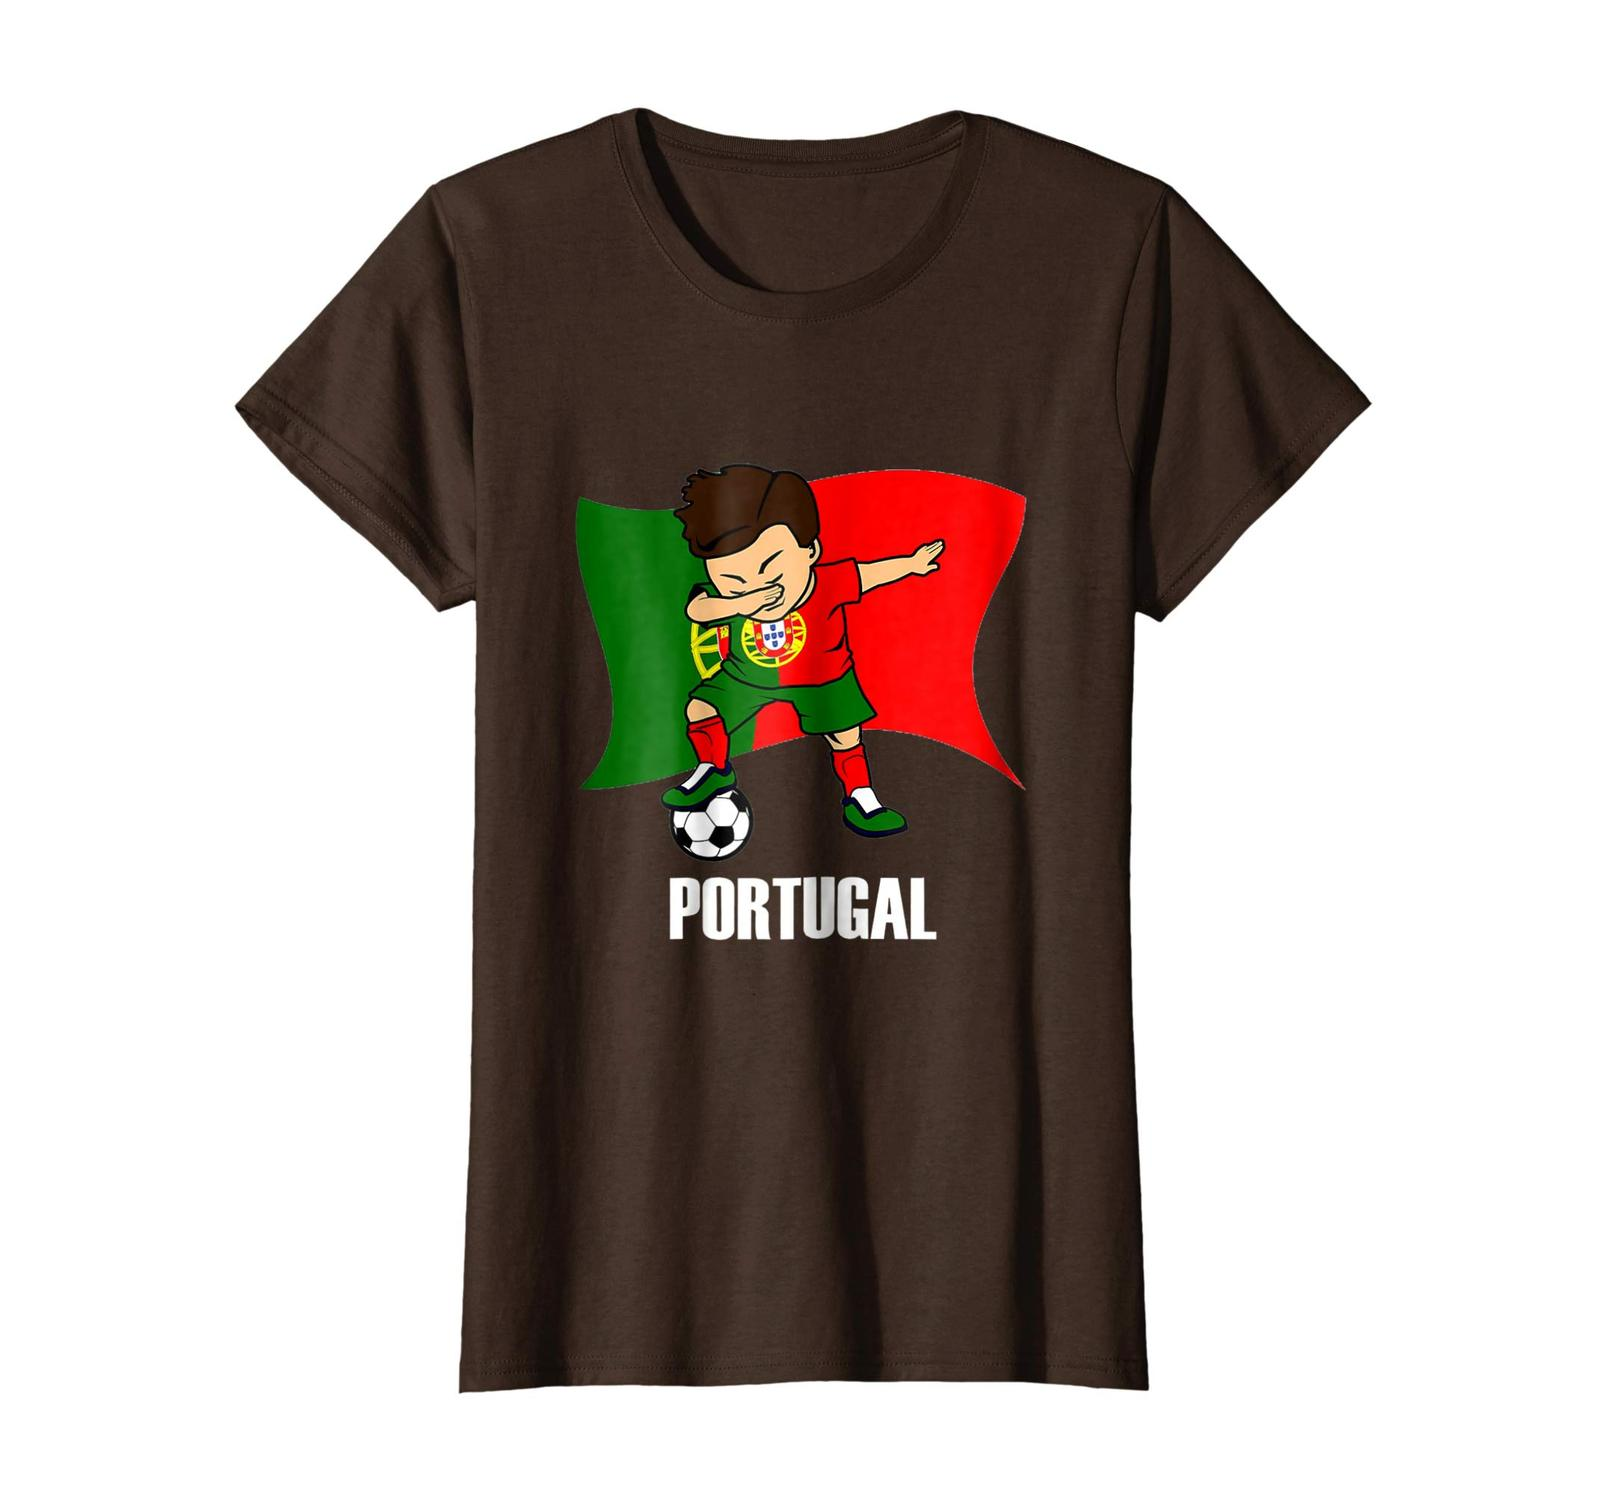 Sport Shirts - Dabbing Tshirt Soccer Boy Portugal Jersey Portugal Football Wowen